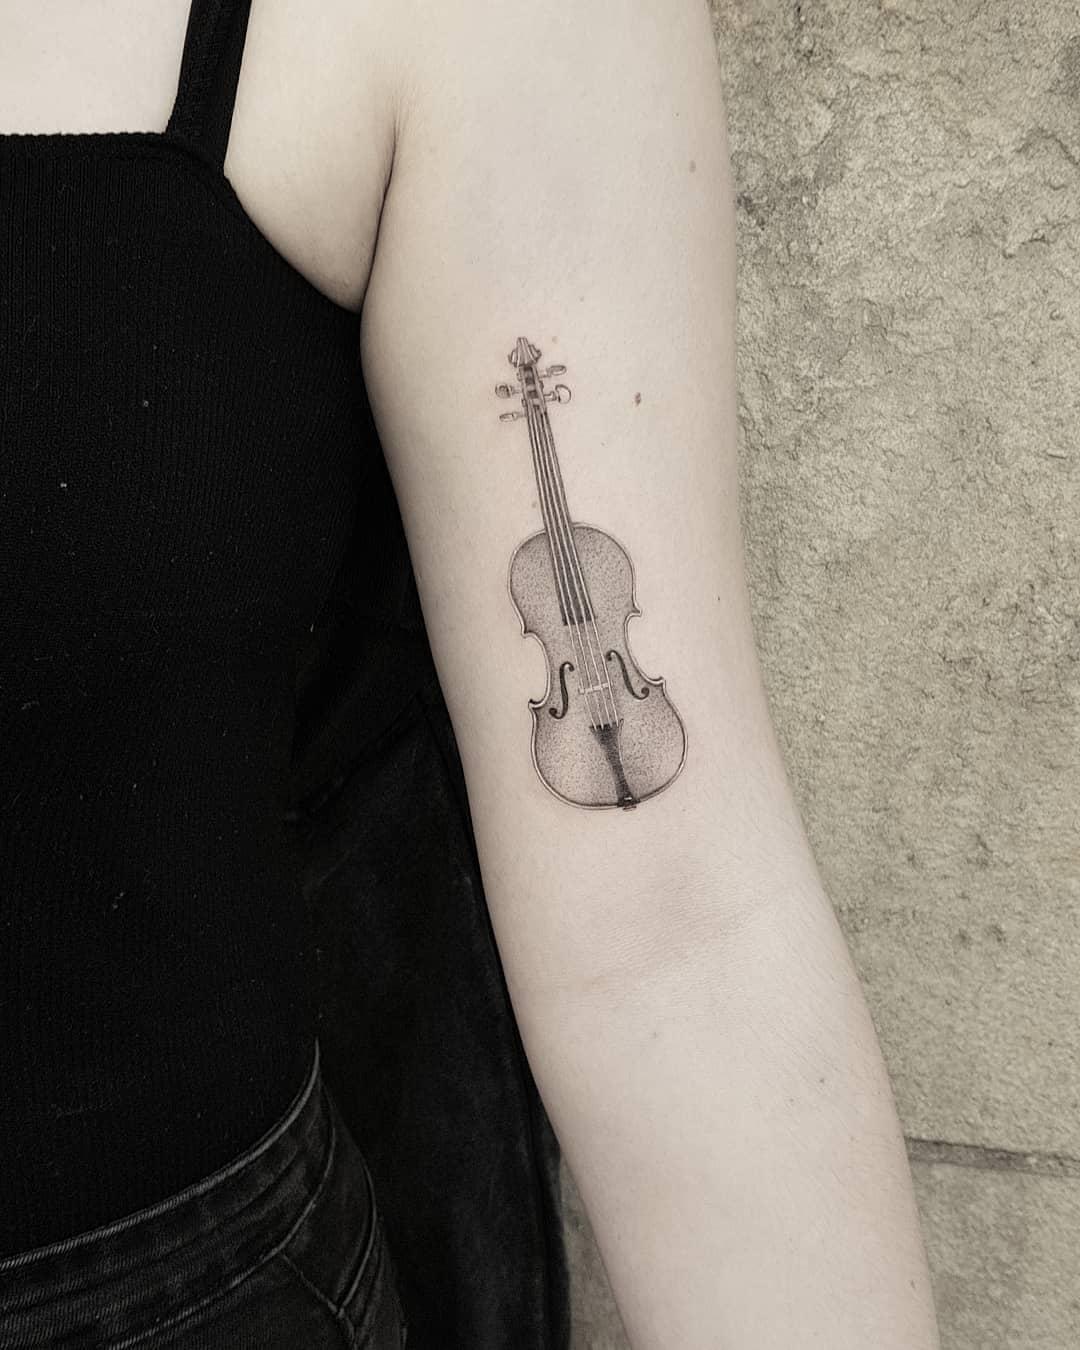 Tattoo of a cello